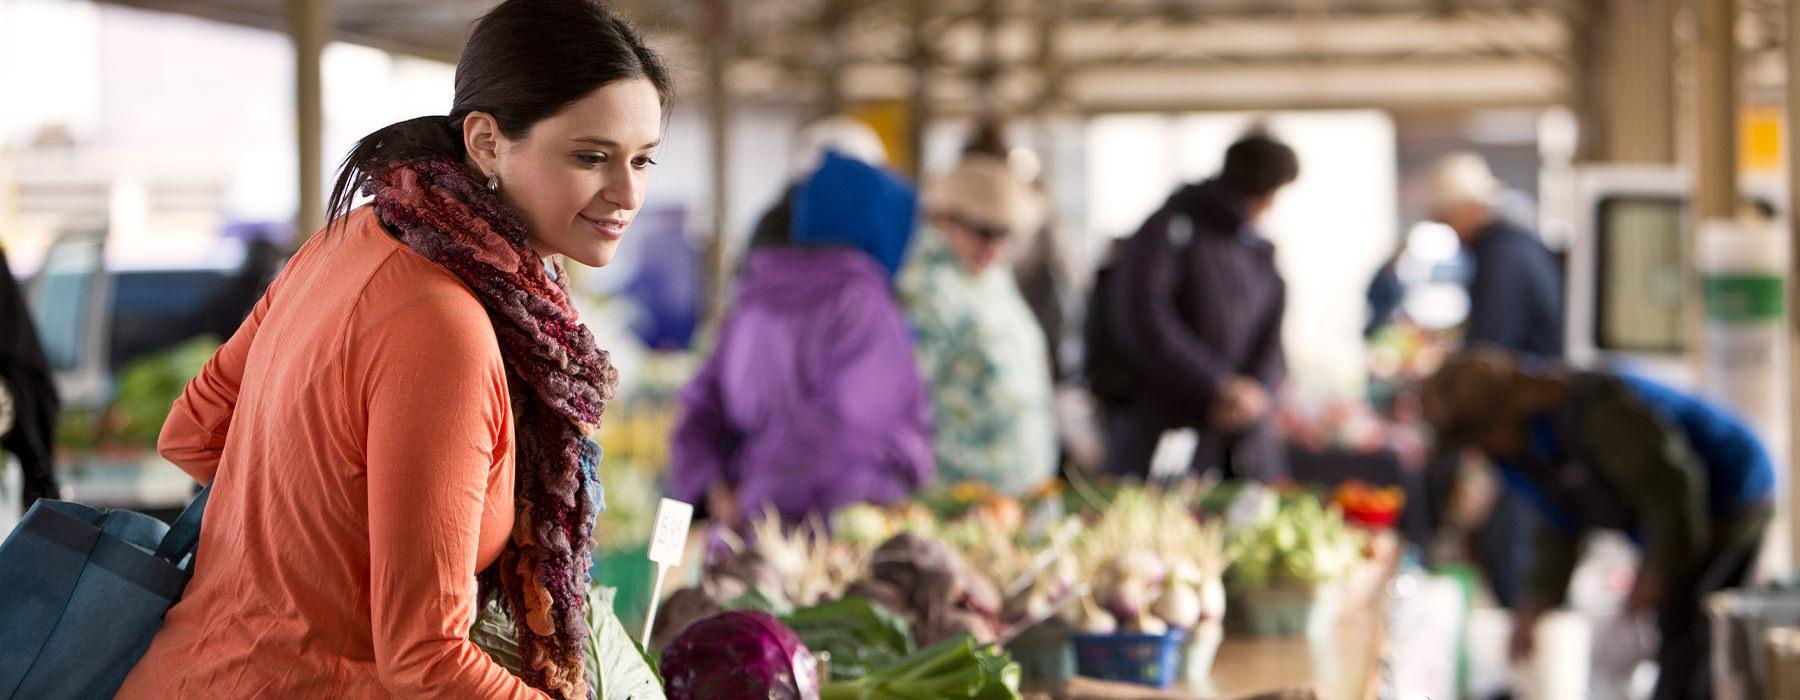 A women smiles while shopping in a vibrant outdoor market.